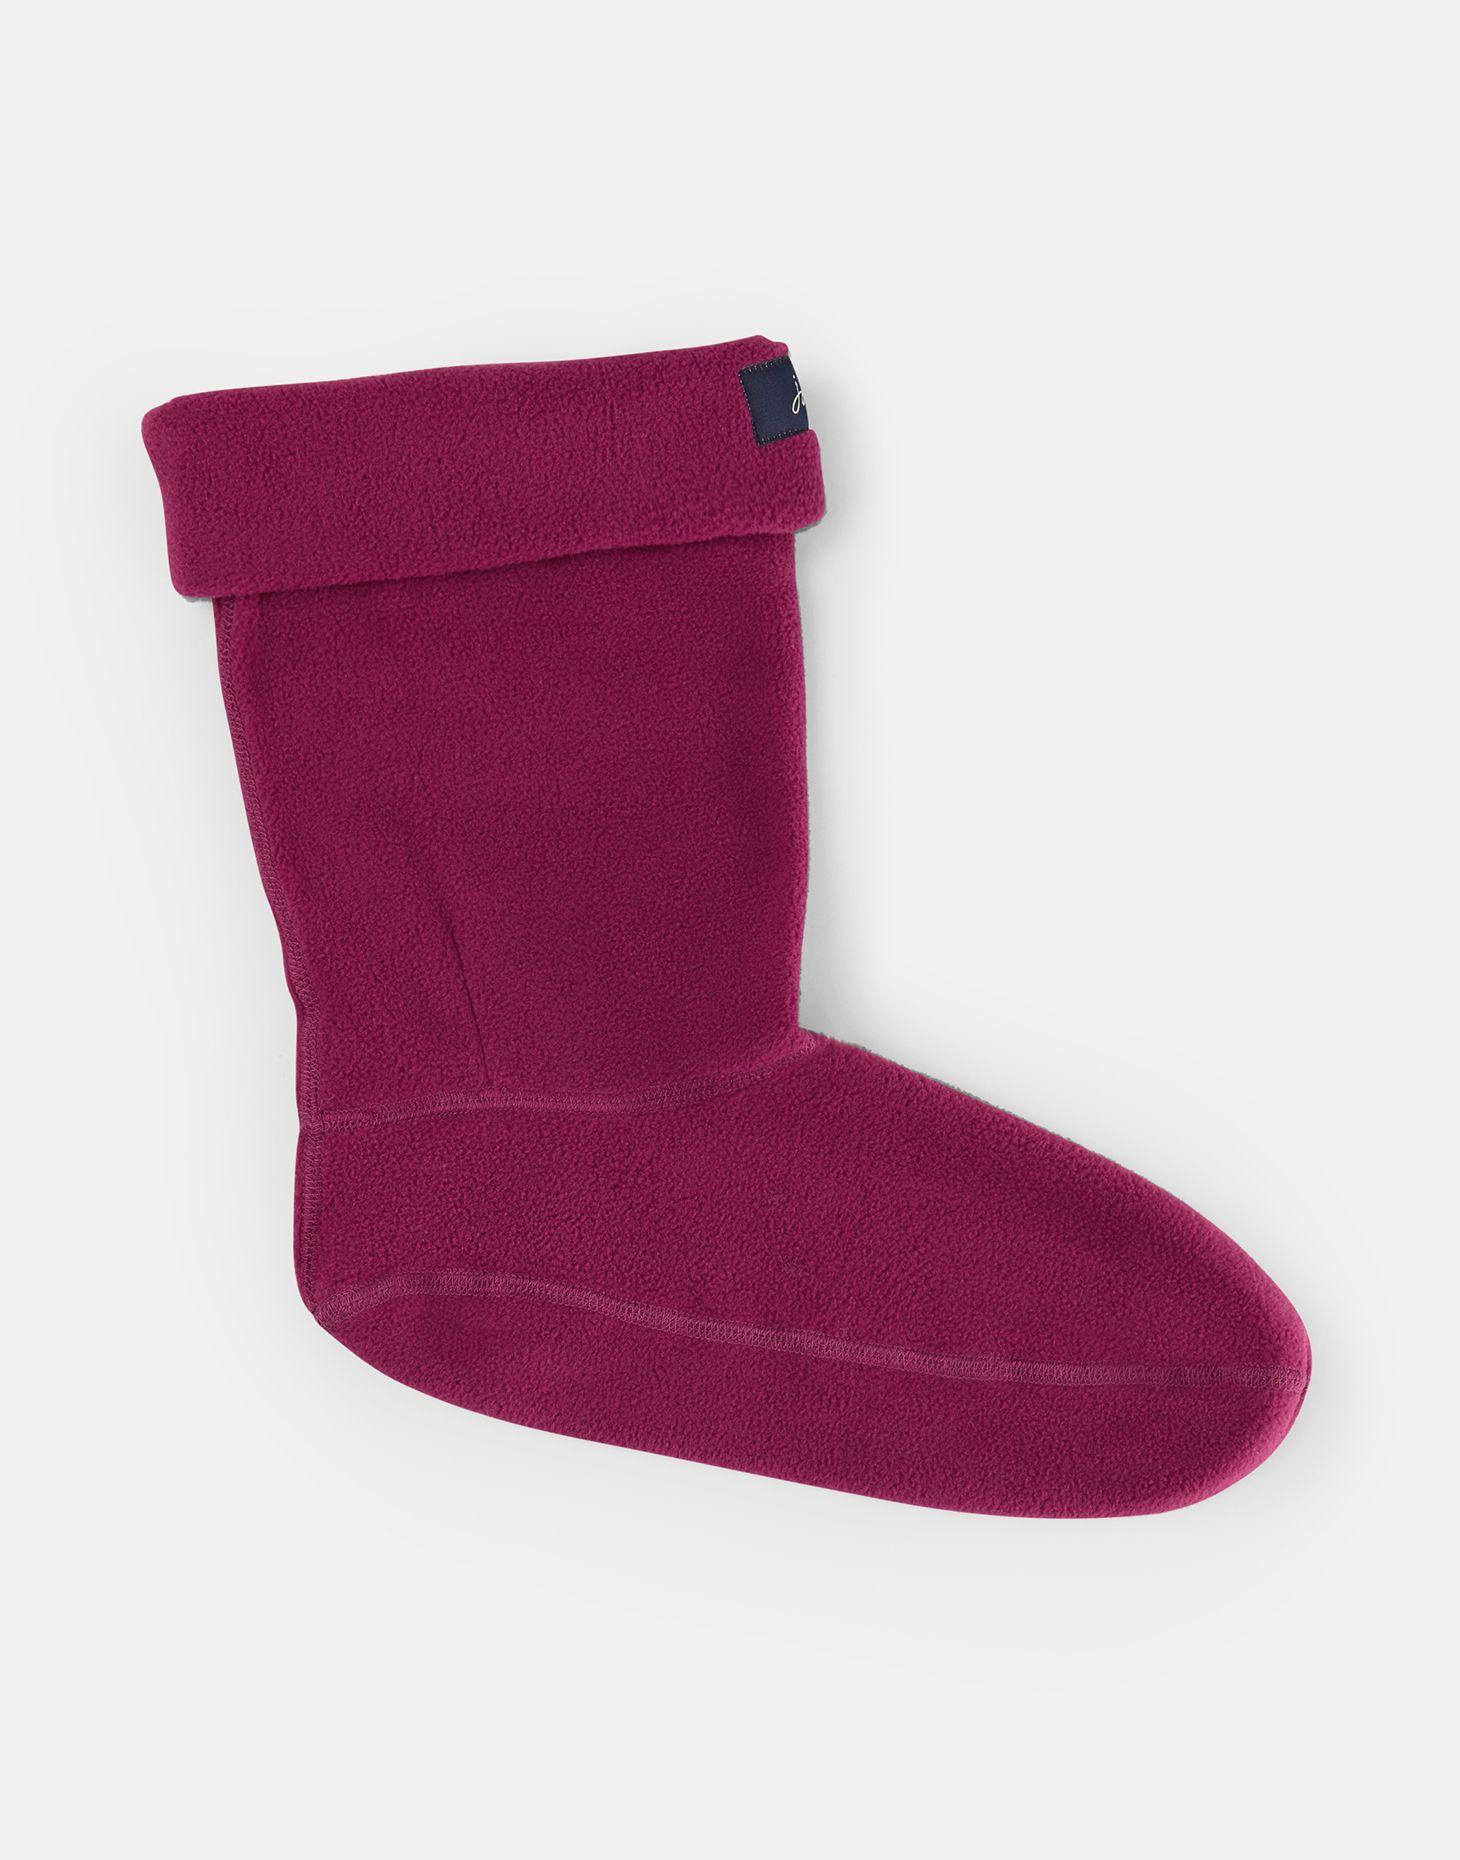 Joules Womens Molly Socks